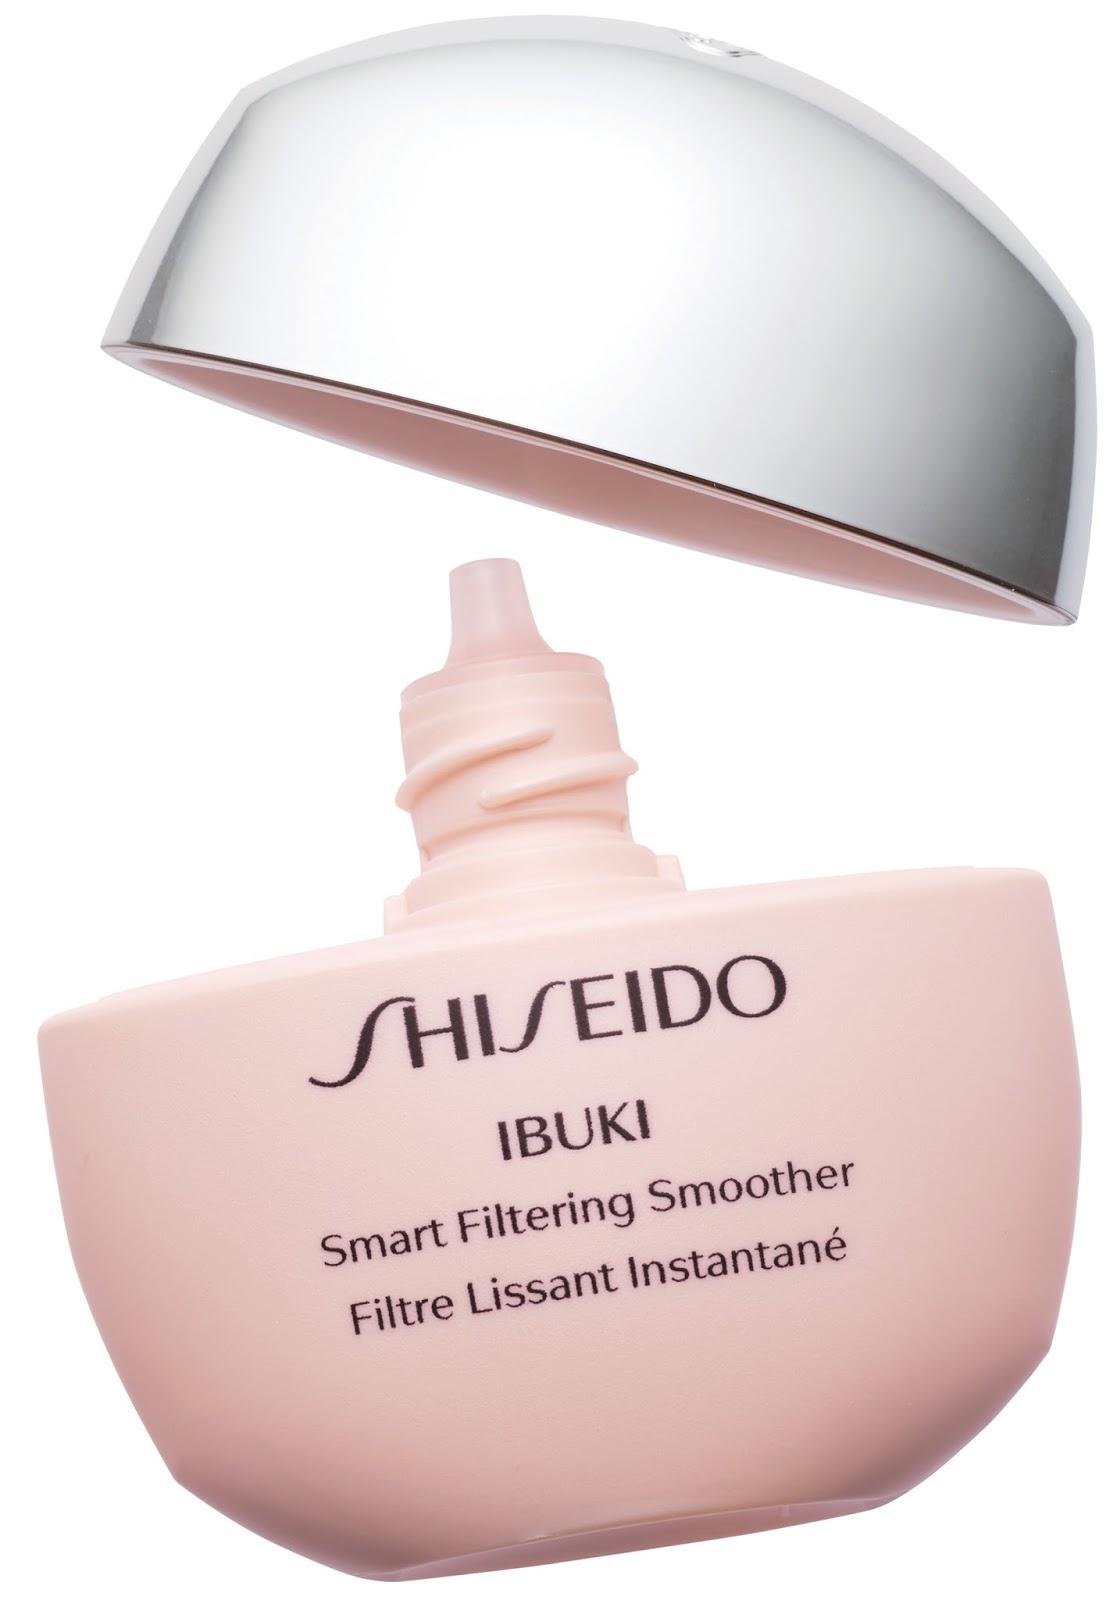 Shiseido Ibuki Smart Filtering Smoother Open